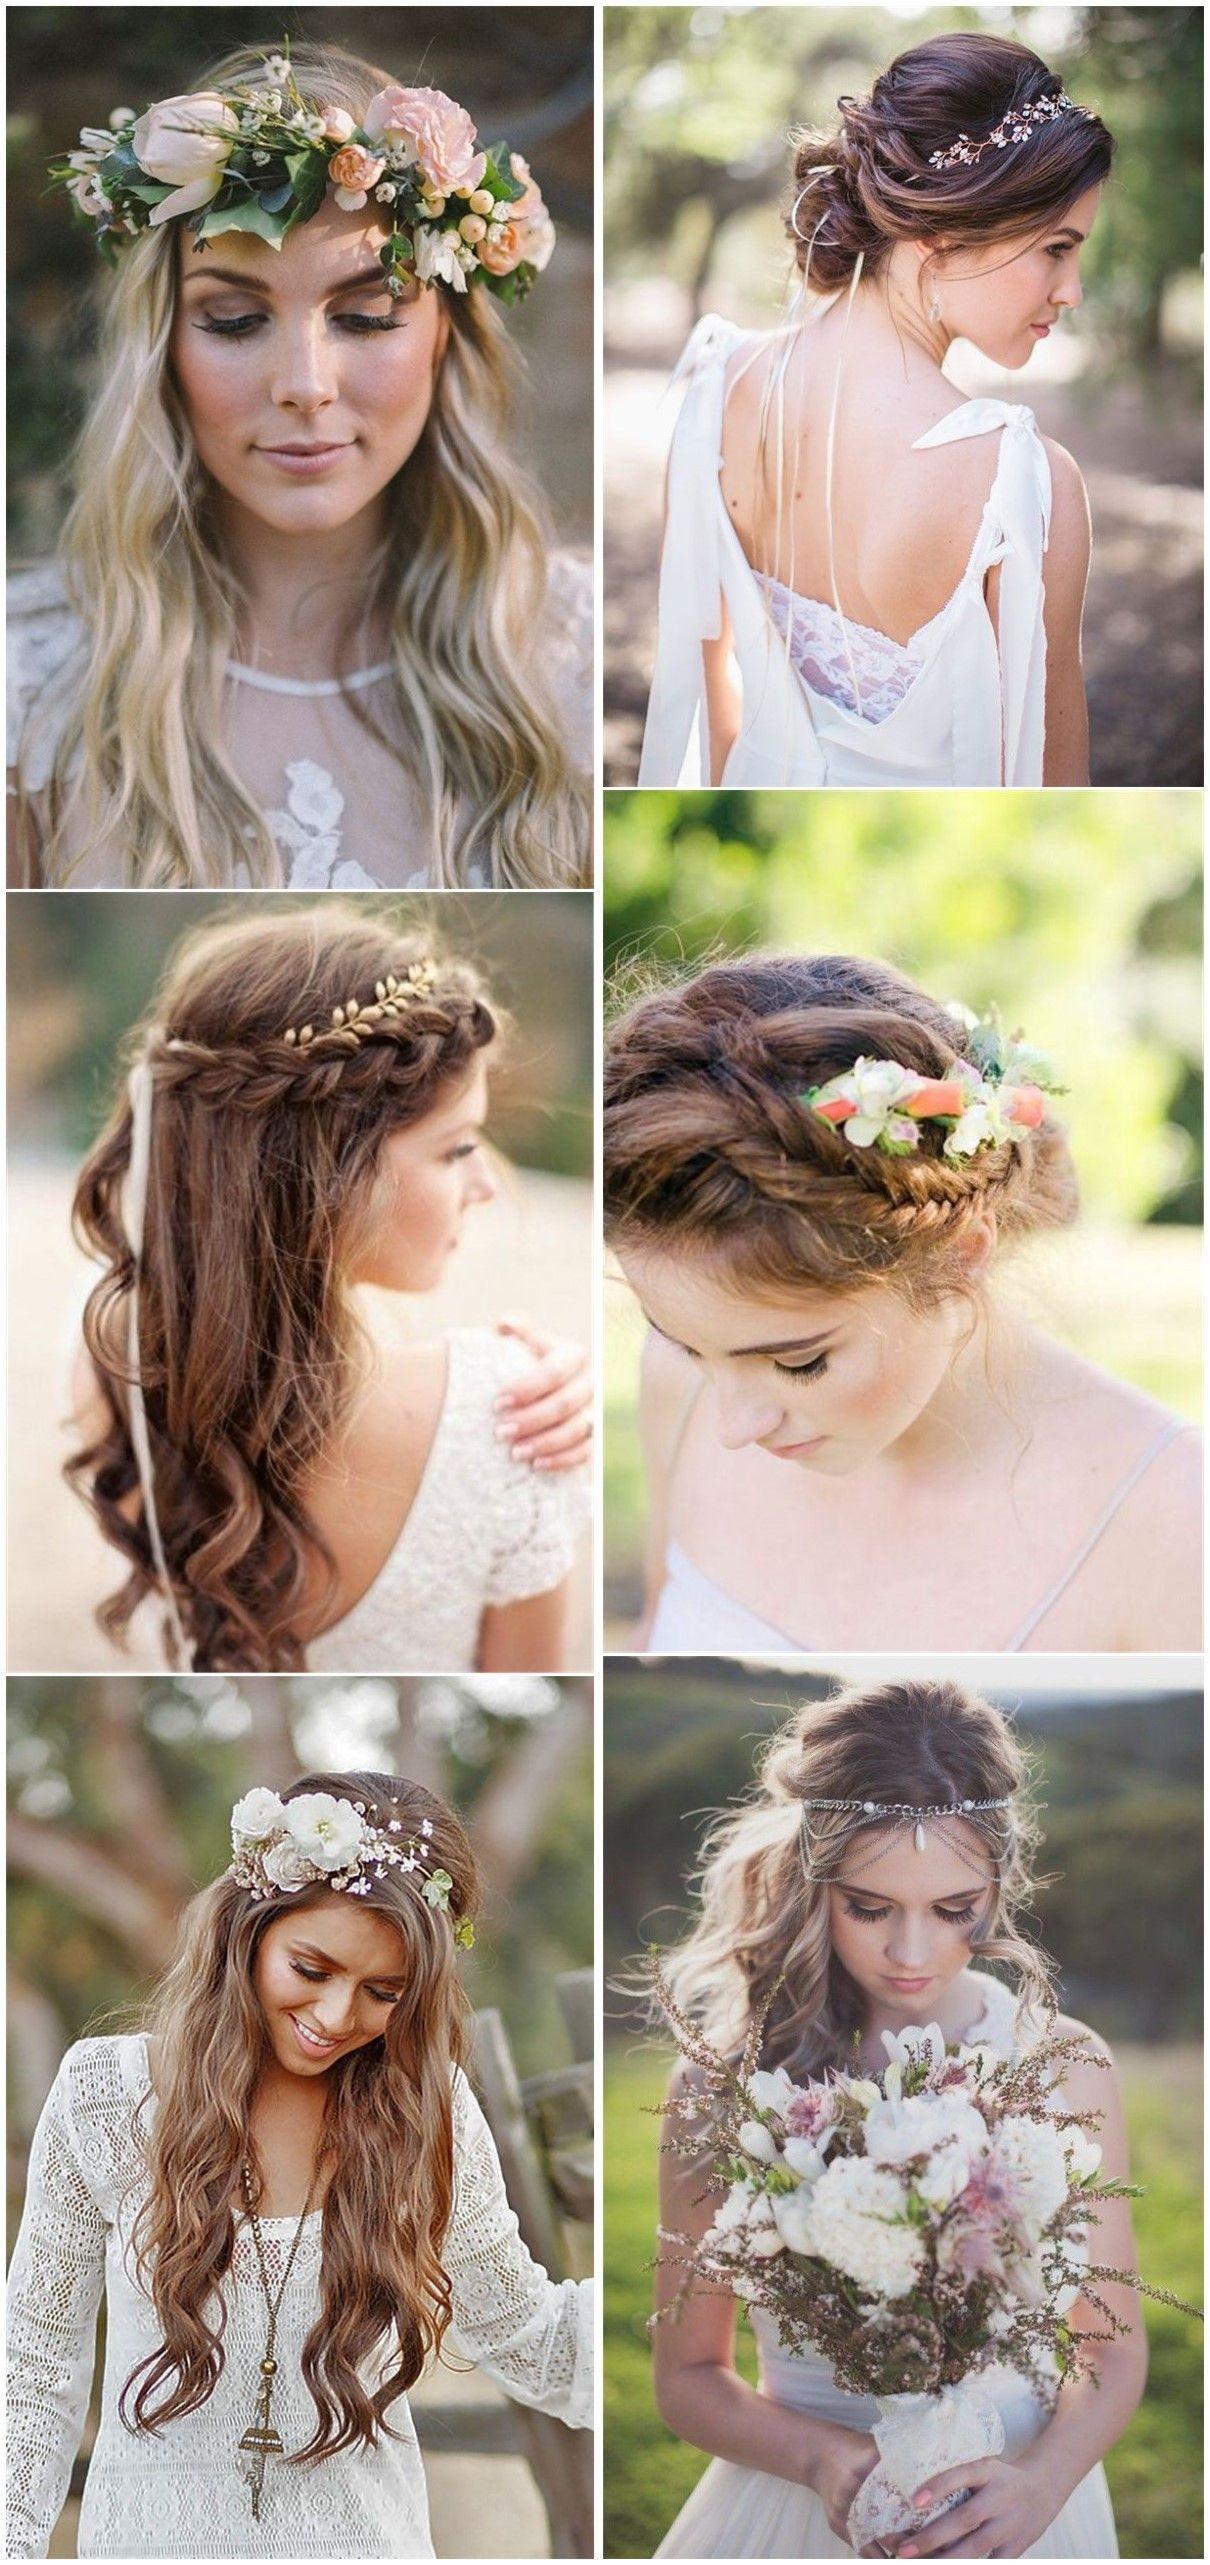 Bohemian Wedding Hairstyles For Short Hair Strapless   21 ...